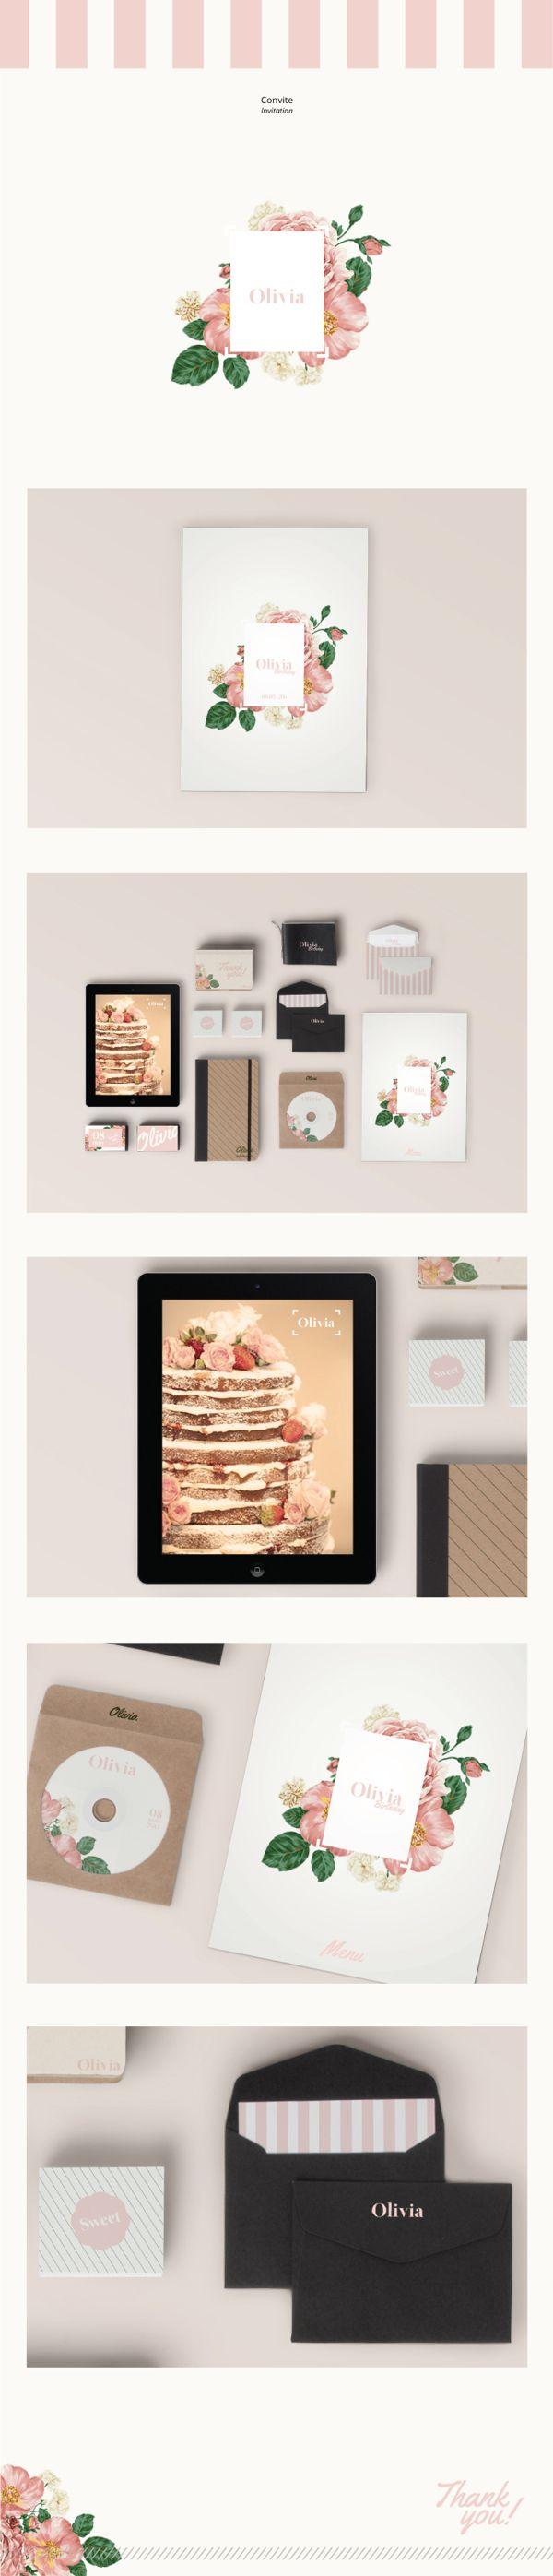 Convite | Invitation | OLIVIA by Cristiane Amaral, via Behance